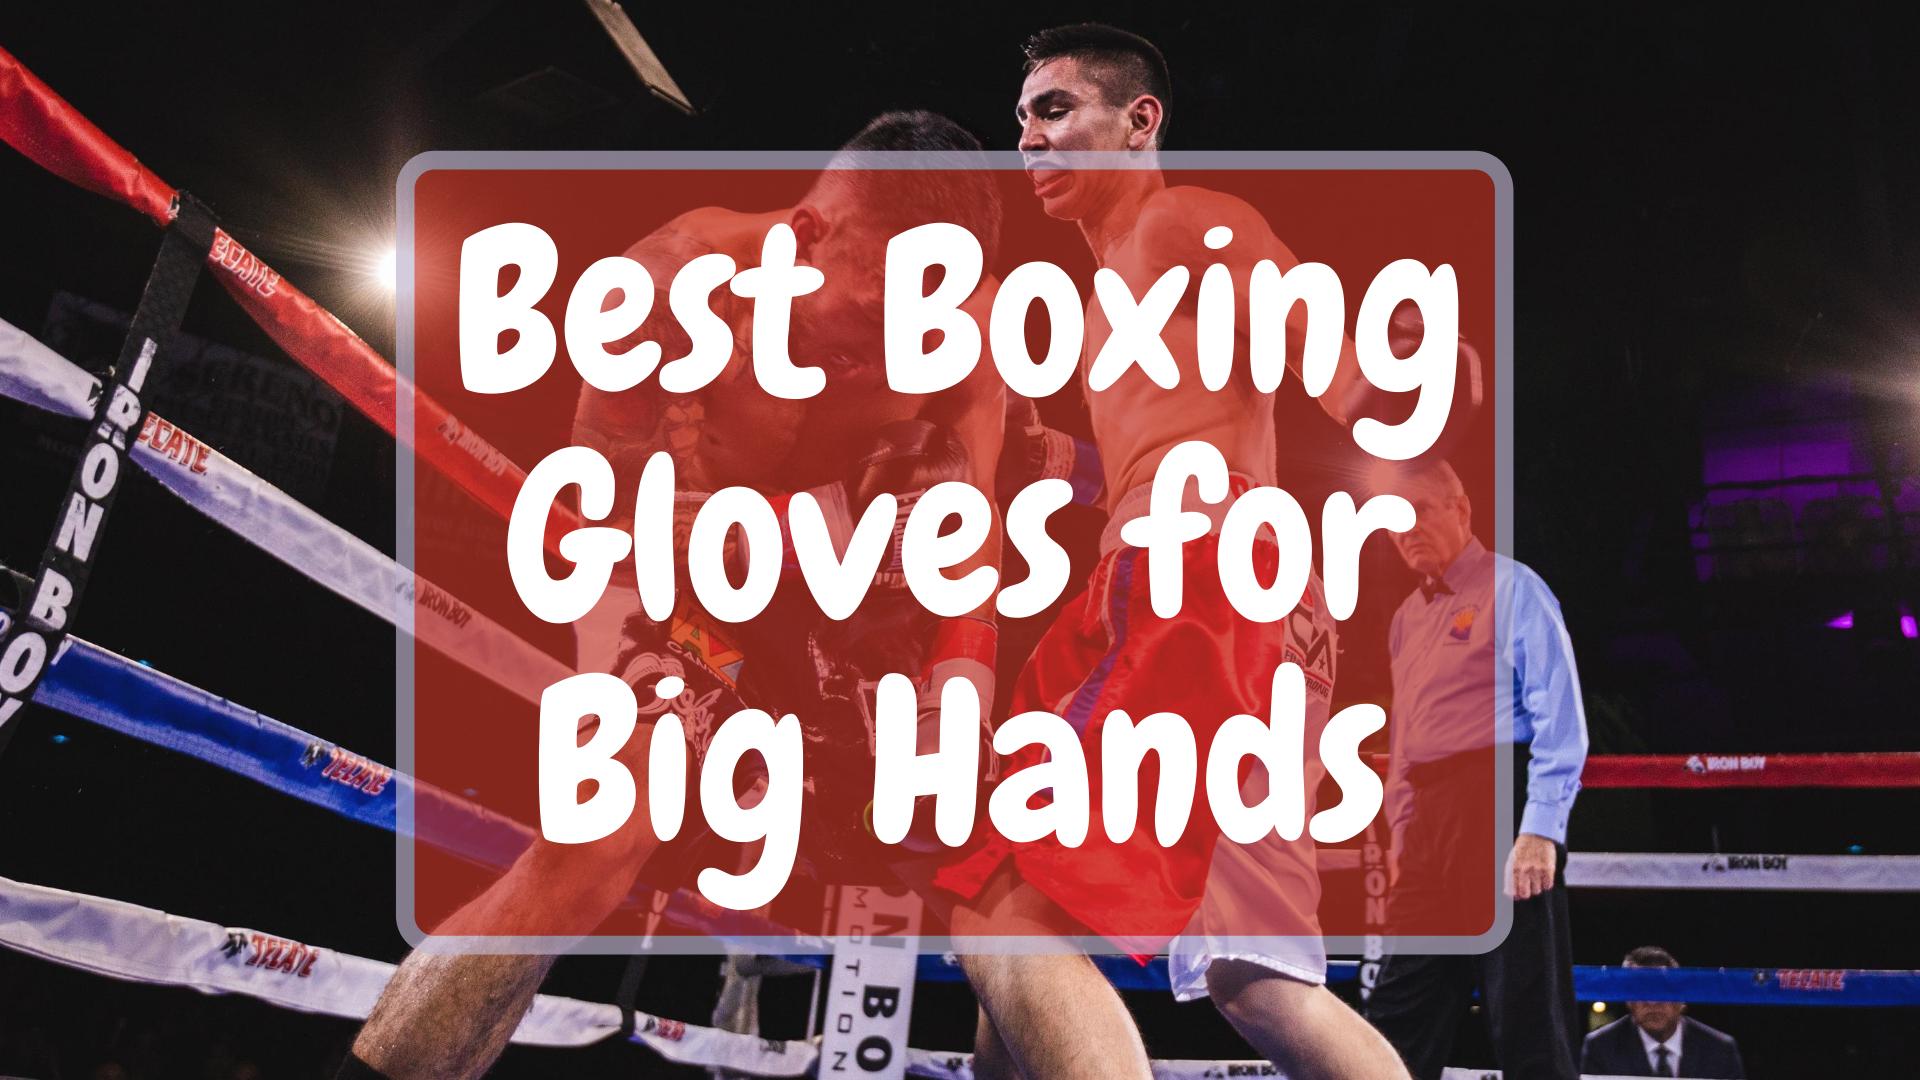 Best Boxing Gloves for big hands